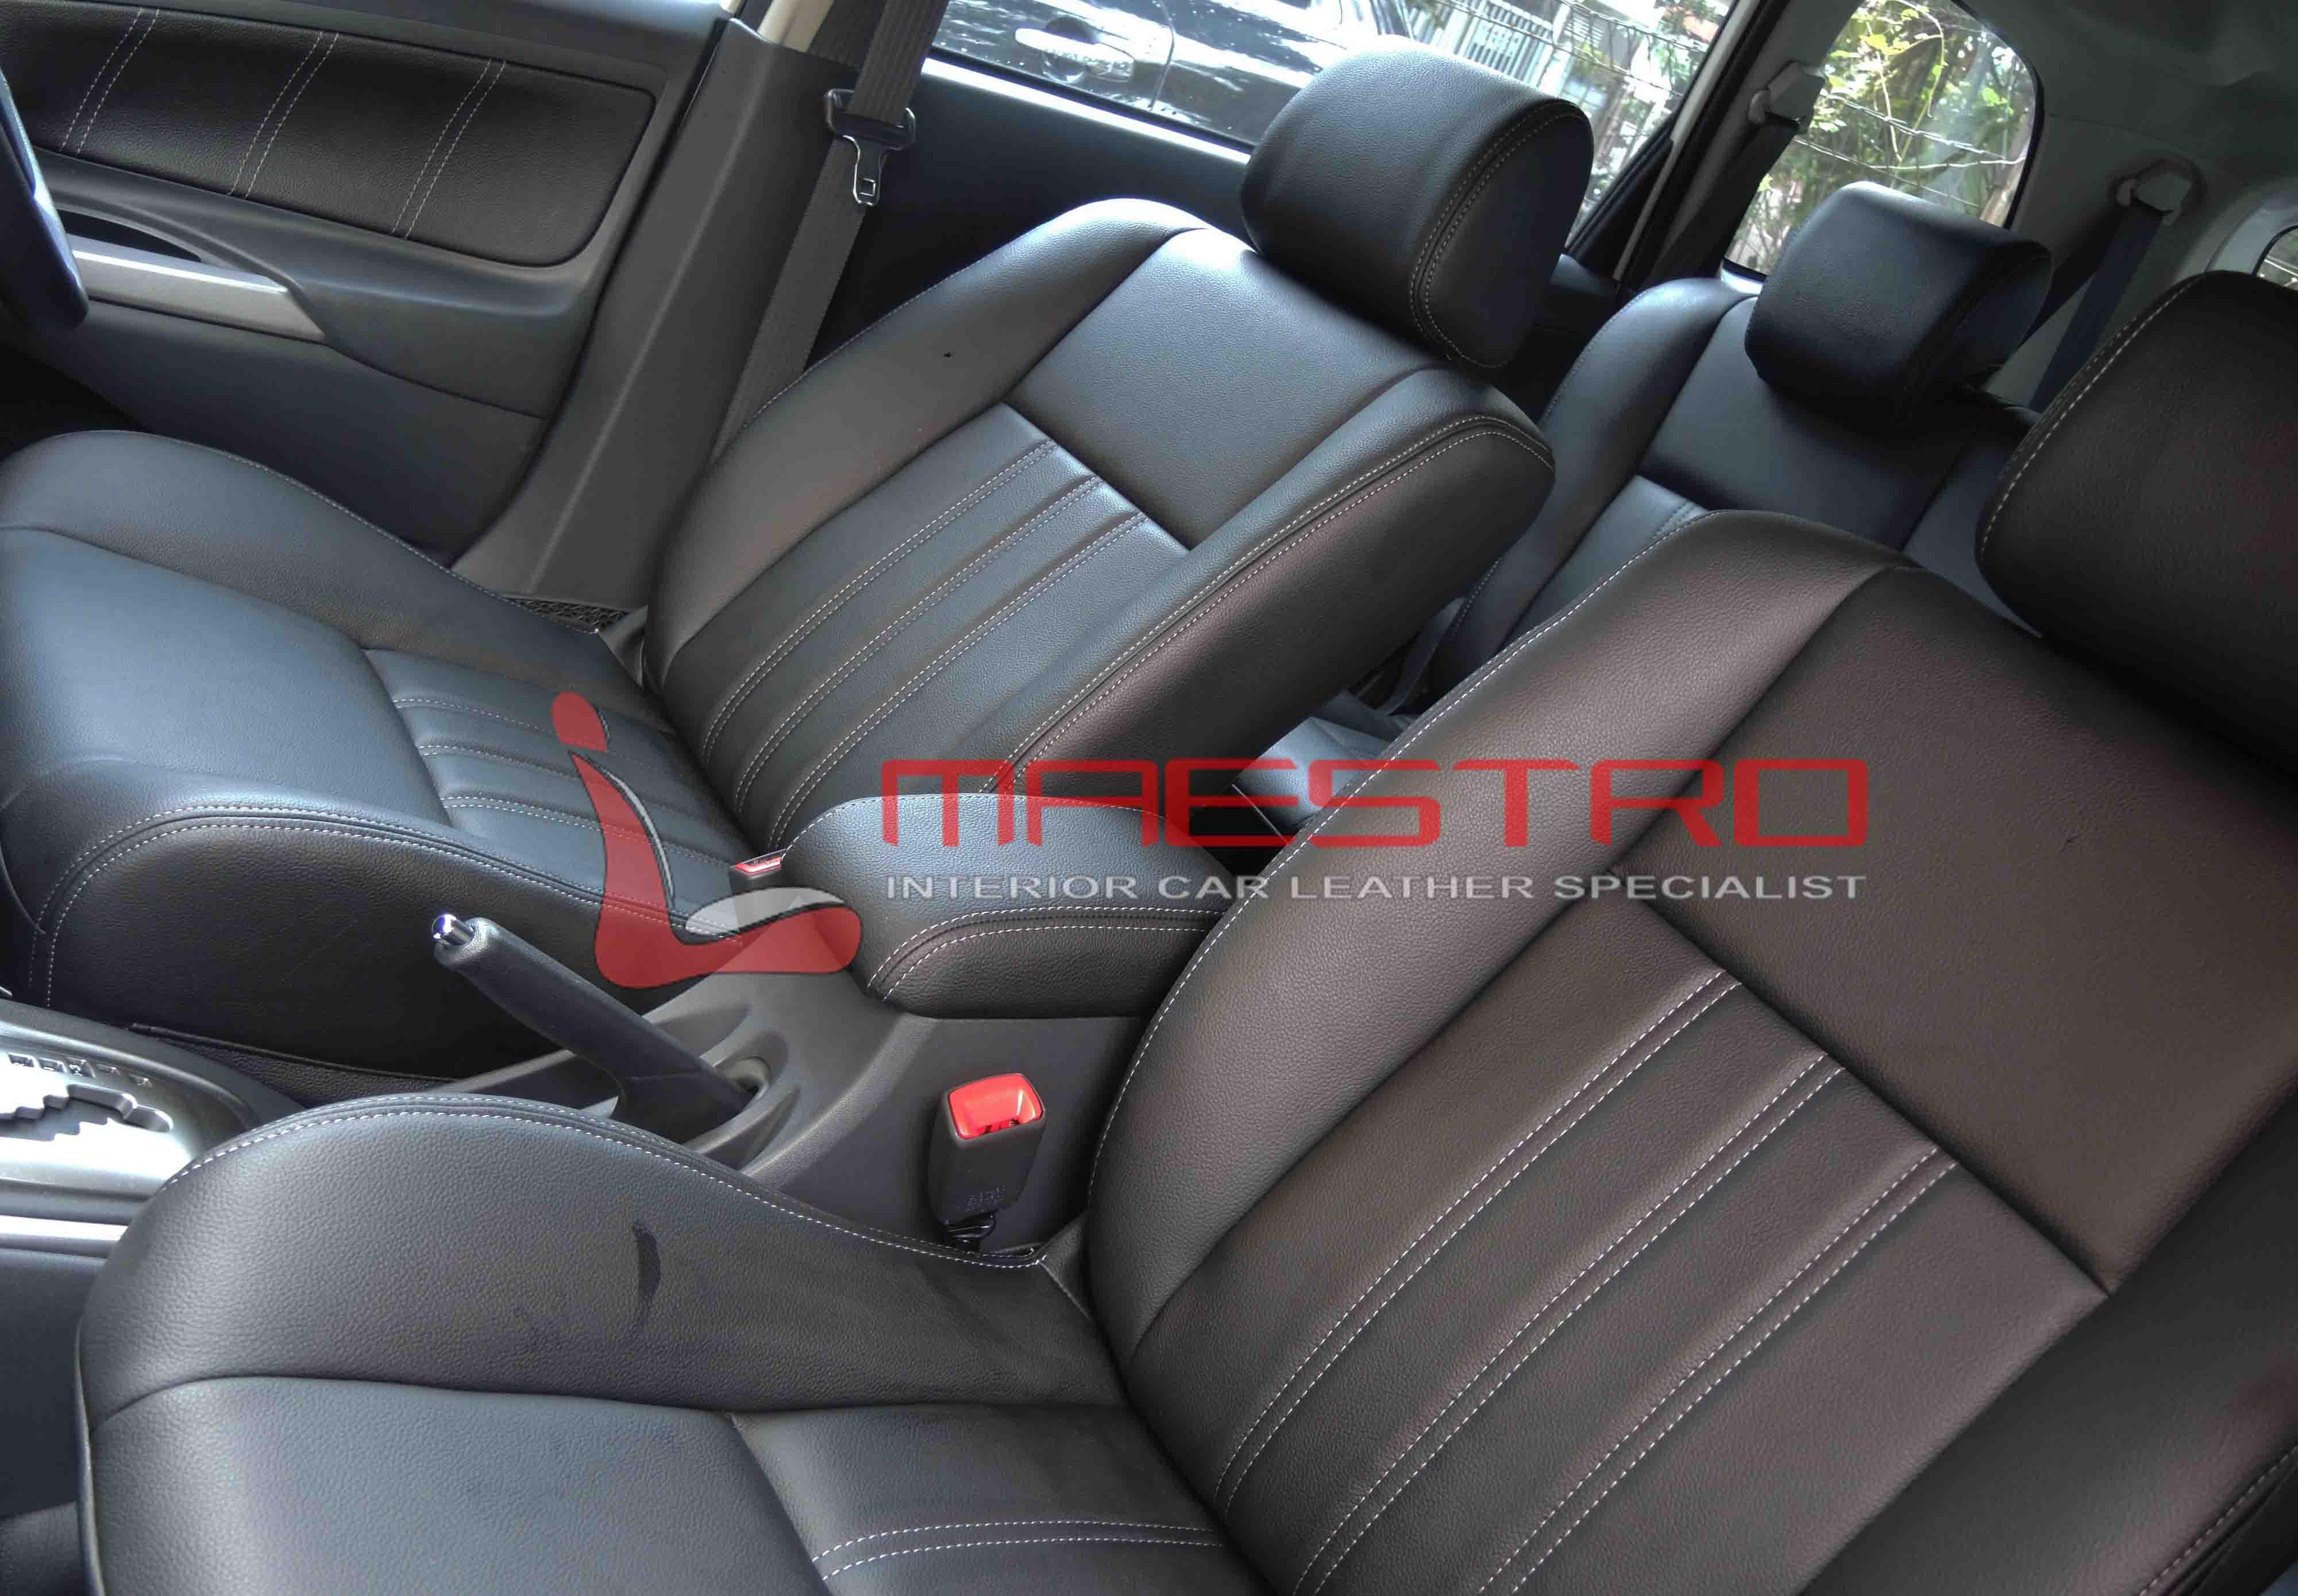 interior grand new avanza 2018 all vellfire 2017 cover jok paten toyota 1 5 veloz maestro pemilihan warna ini menyesuaikan dengan mobil yang juga hitam dan memang kain asli bawaan pabriknya berwarna